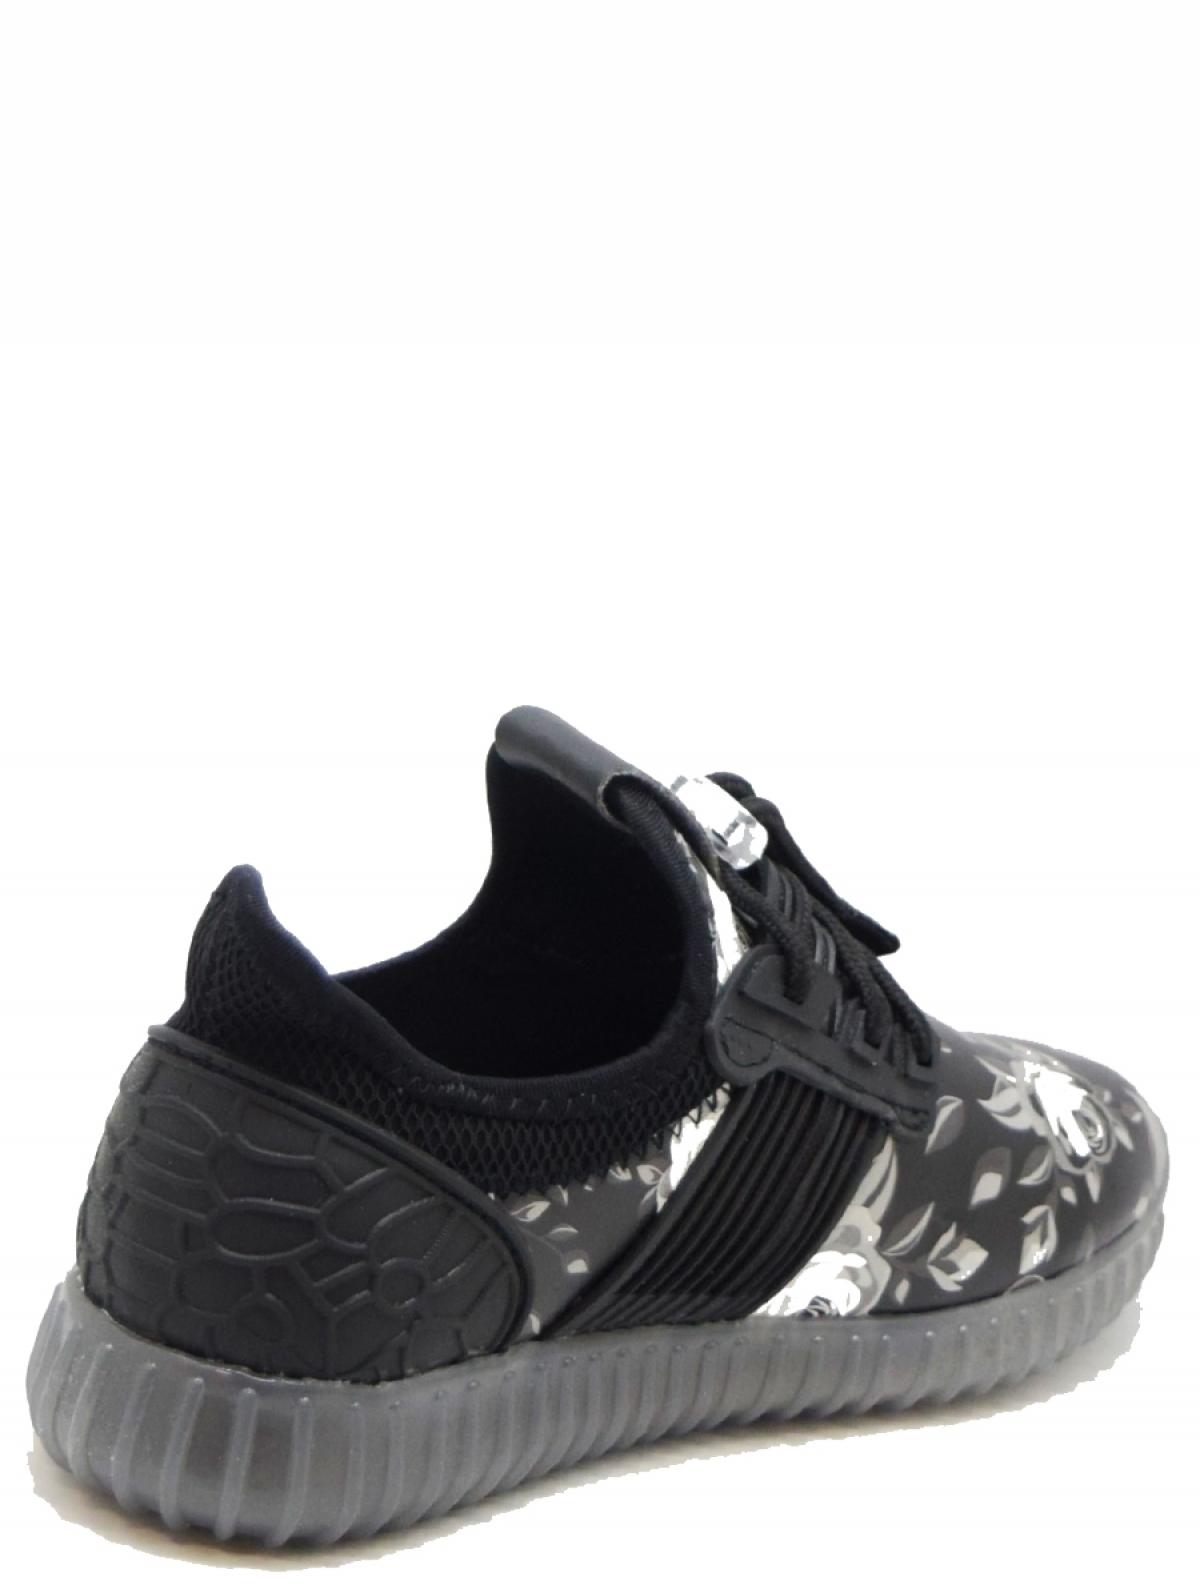 E7300 кросcовки для девочки